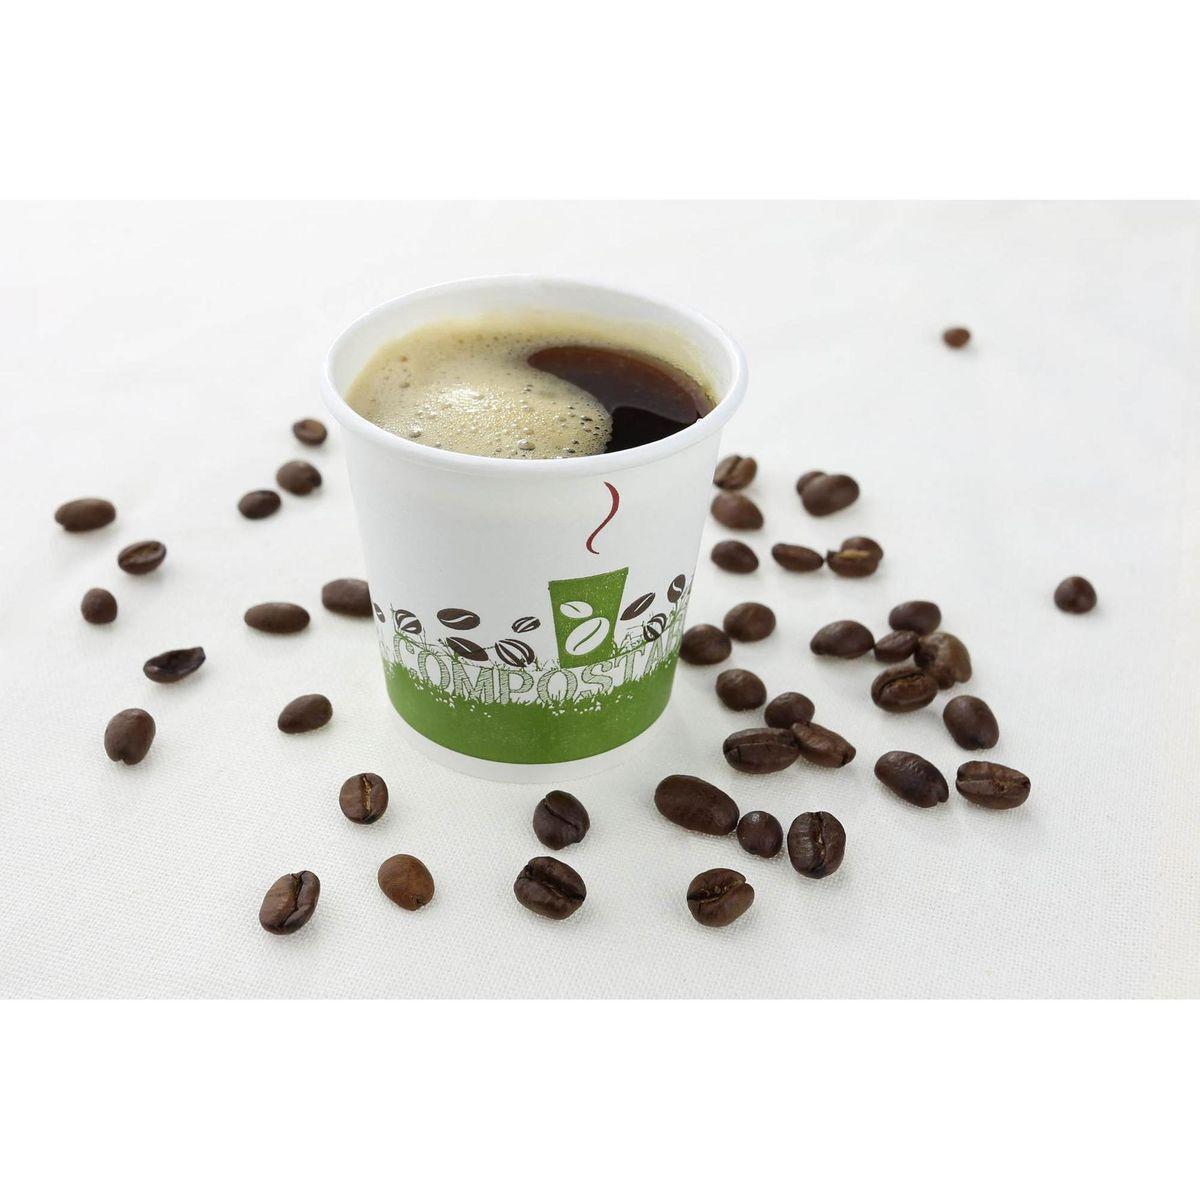 bepulp 20 Gobelets 10 cl biodegradable